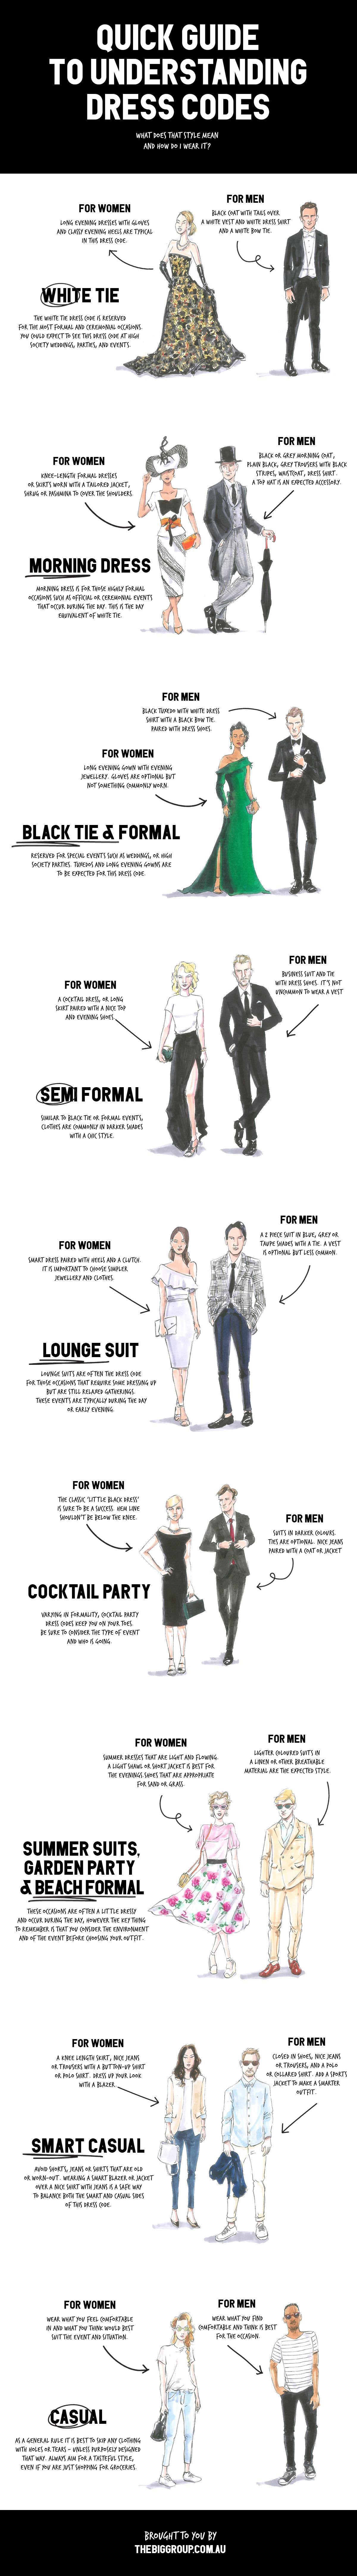 Wedding Dress Codes.What To Wear To A Destination Wedding Maui S Angels Blog